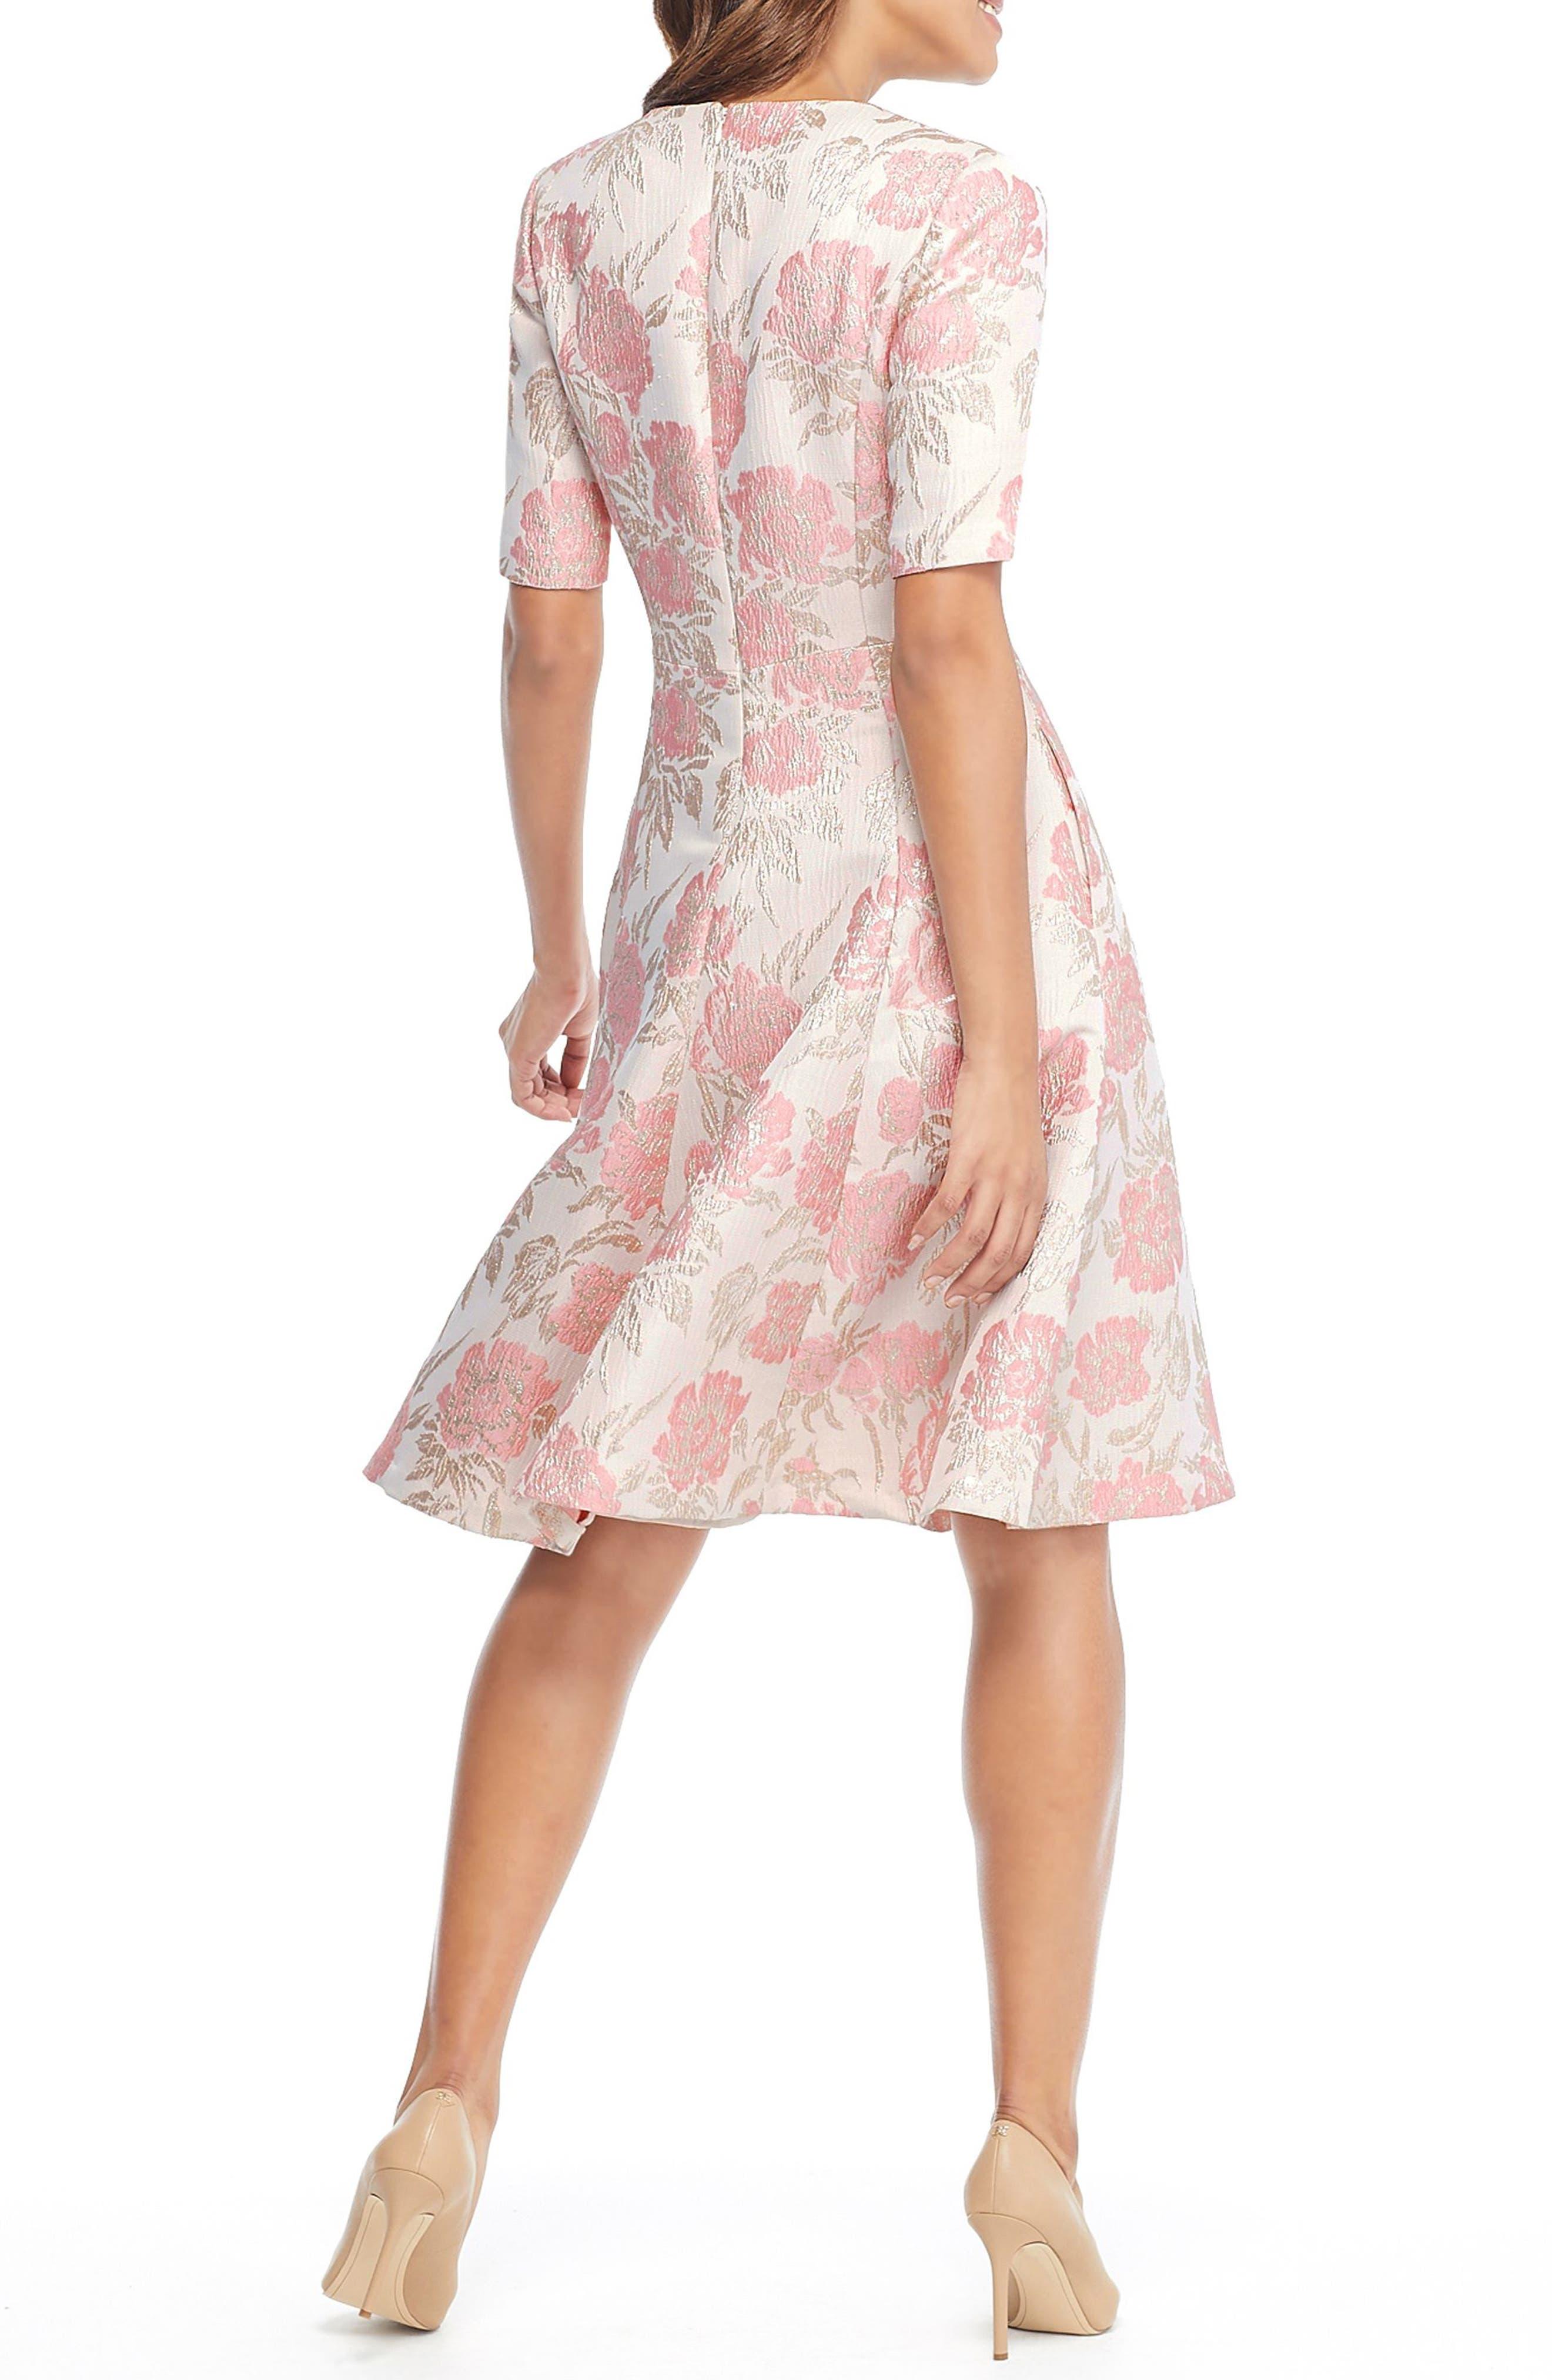 Adair Pink Passion Rose Jacquard Fit & Flare Dress,                             Alternate thumbnail 3, color,                             PINK PEARL